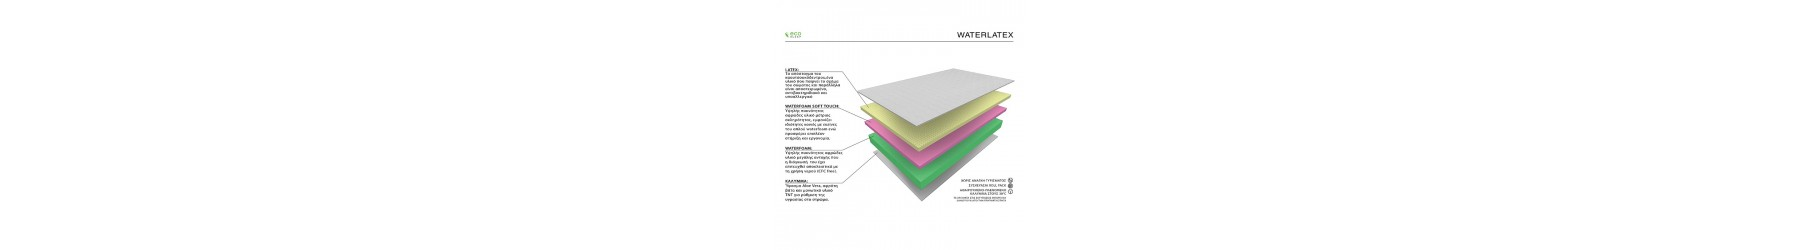 WATER LATEX Στρώματα με ανατομικό και ορθοπεδικό σχεδιασμό